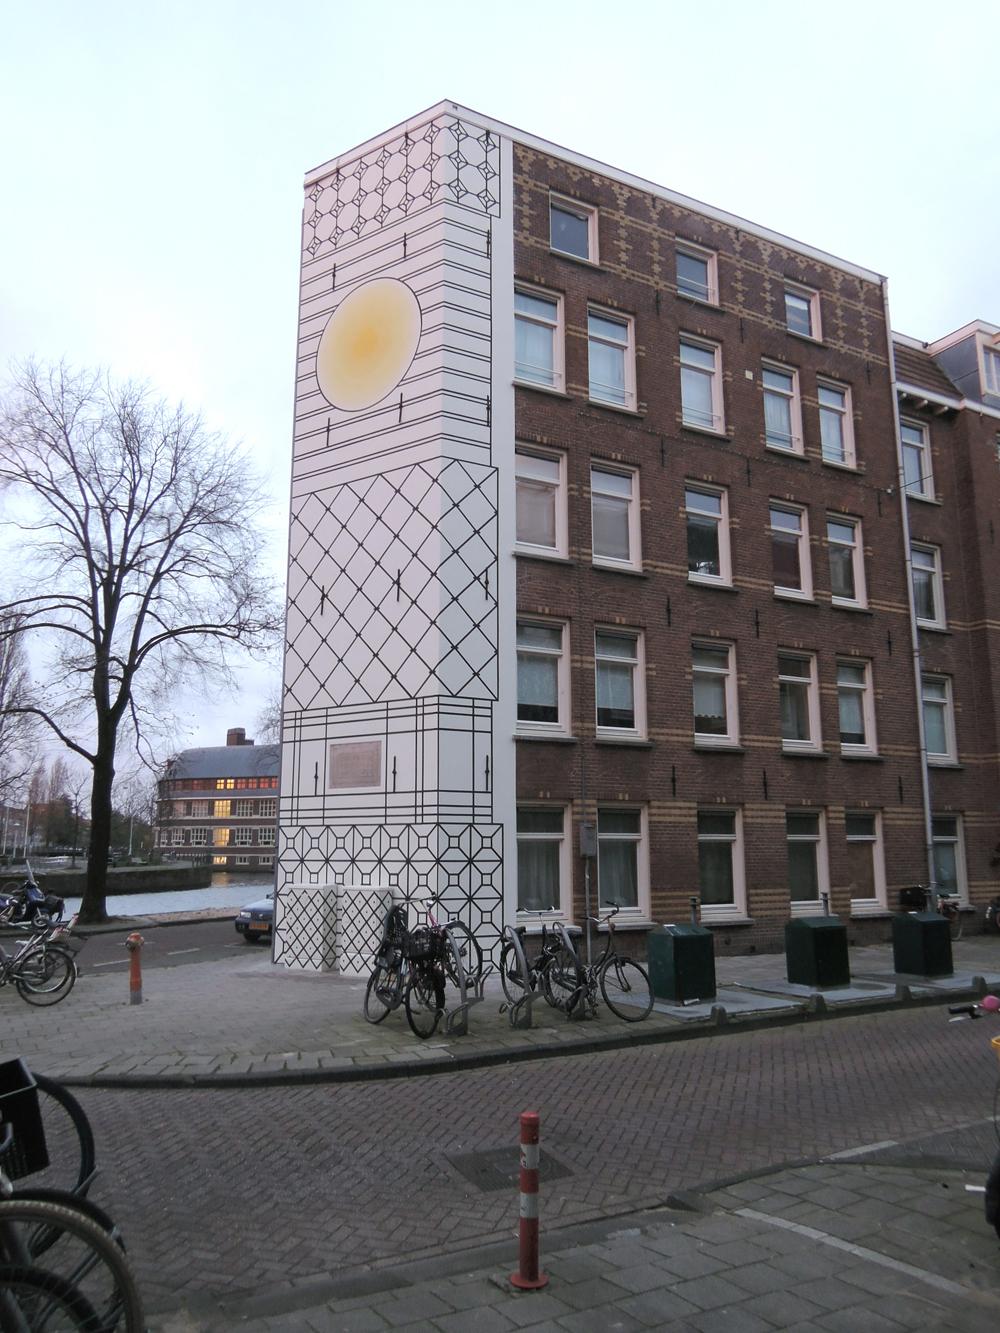 Aam Solleveld Kostverlorenkade-Jacob van Lennepstraat Amsterdam